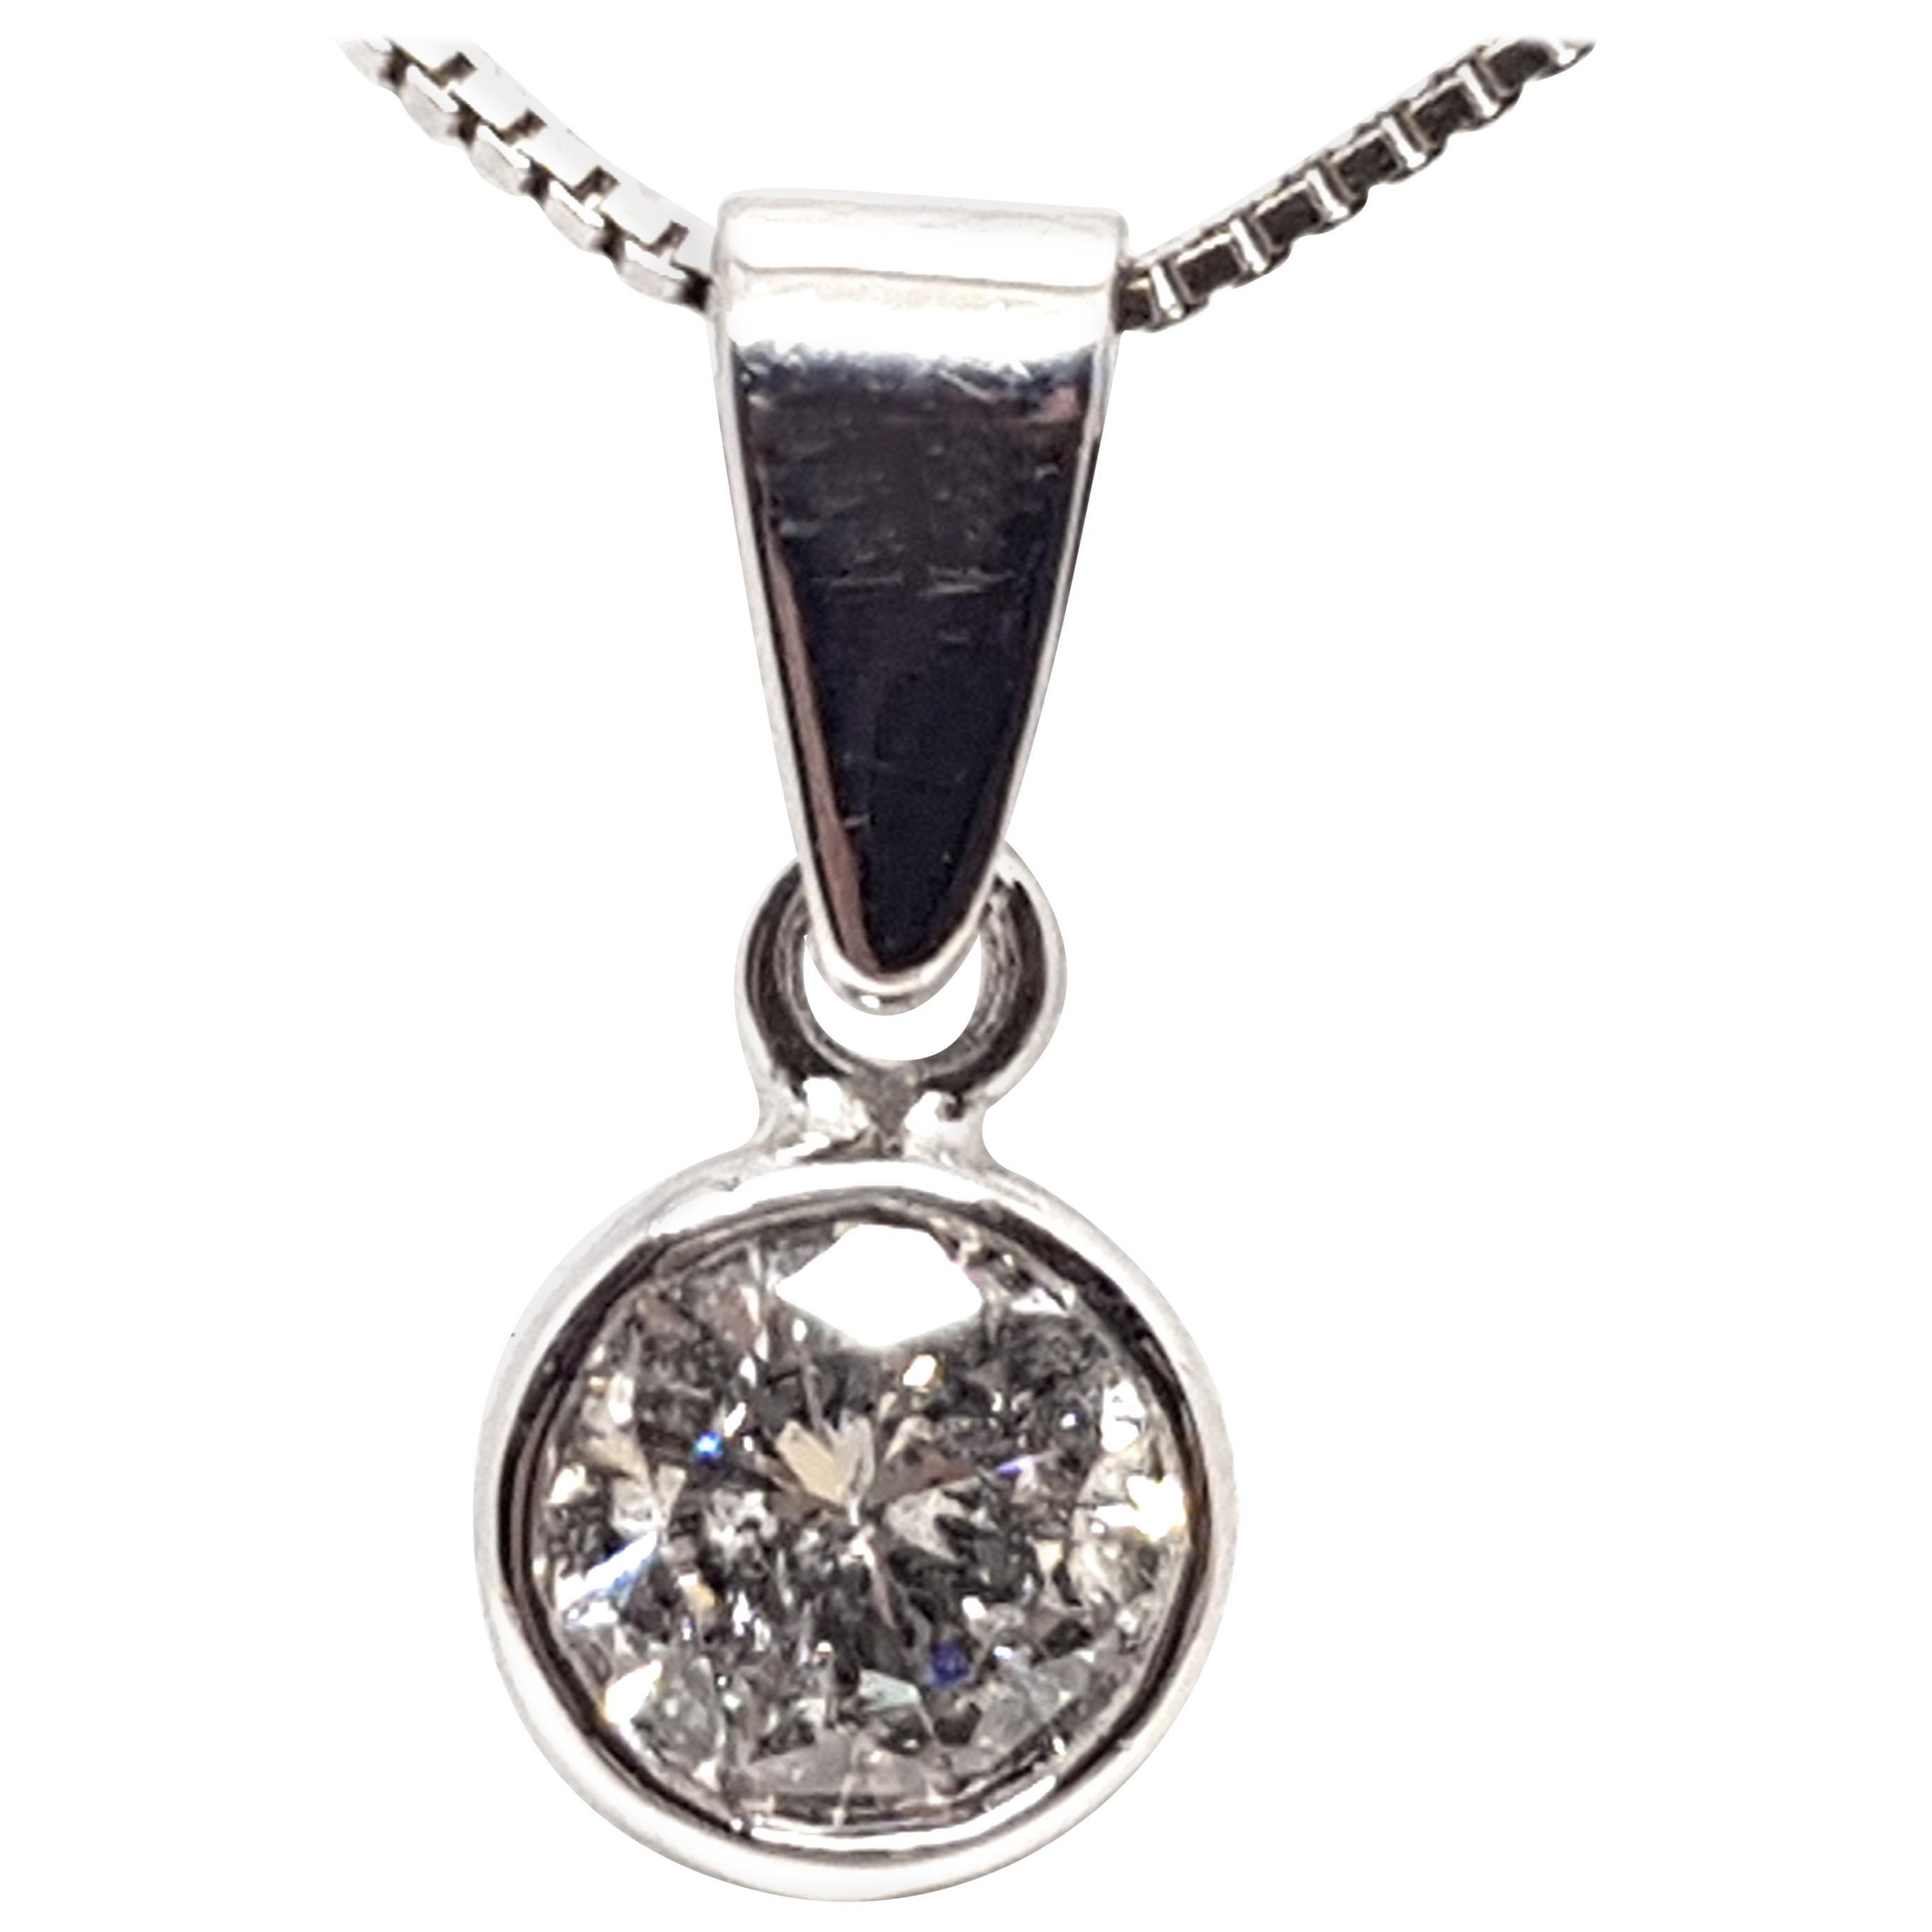 0.61 Carat White Gold Necklace Diamond Solitaire Pendant